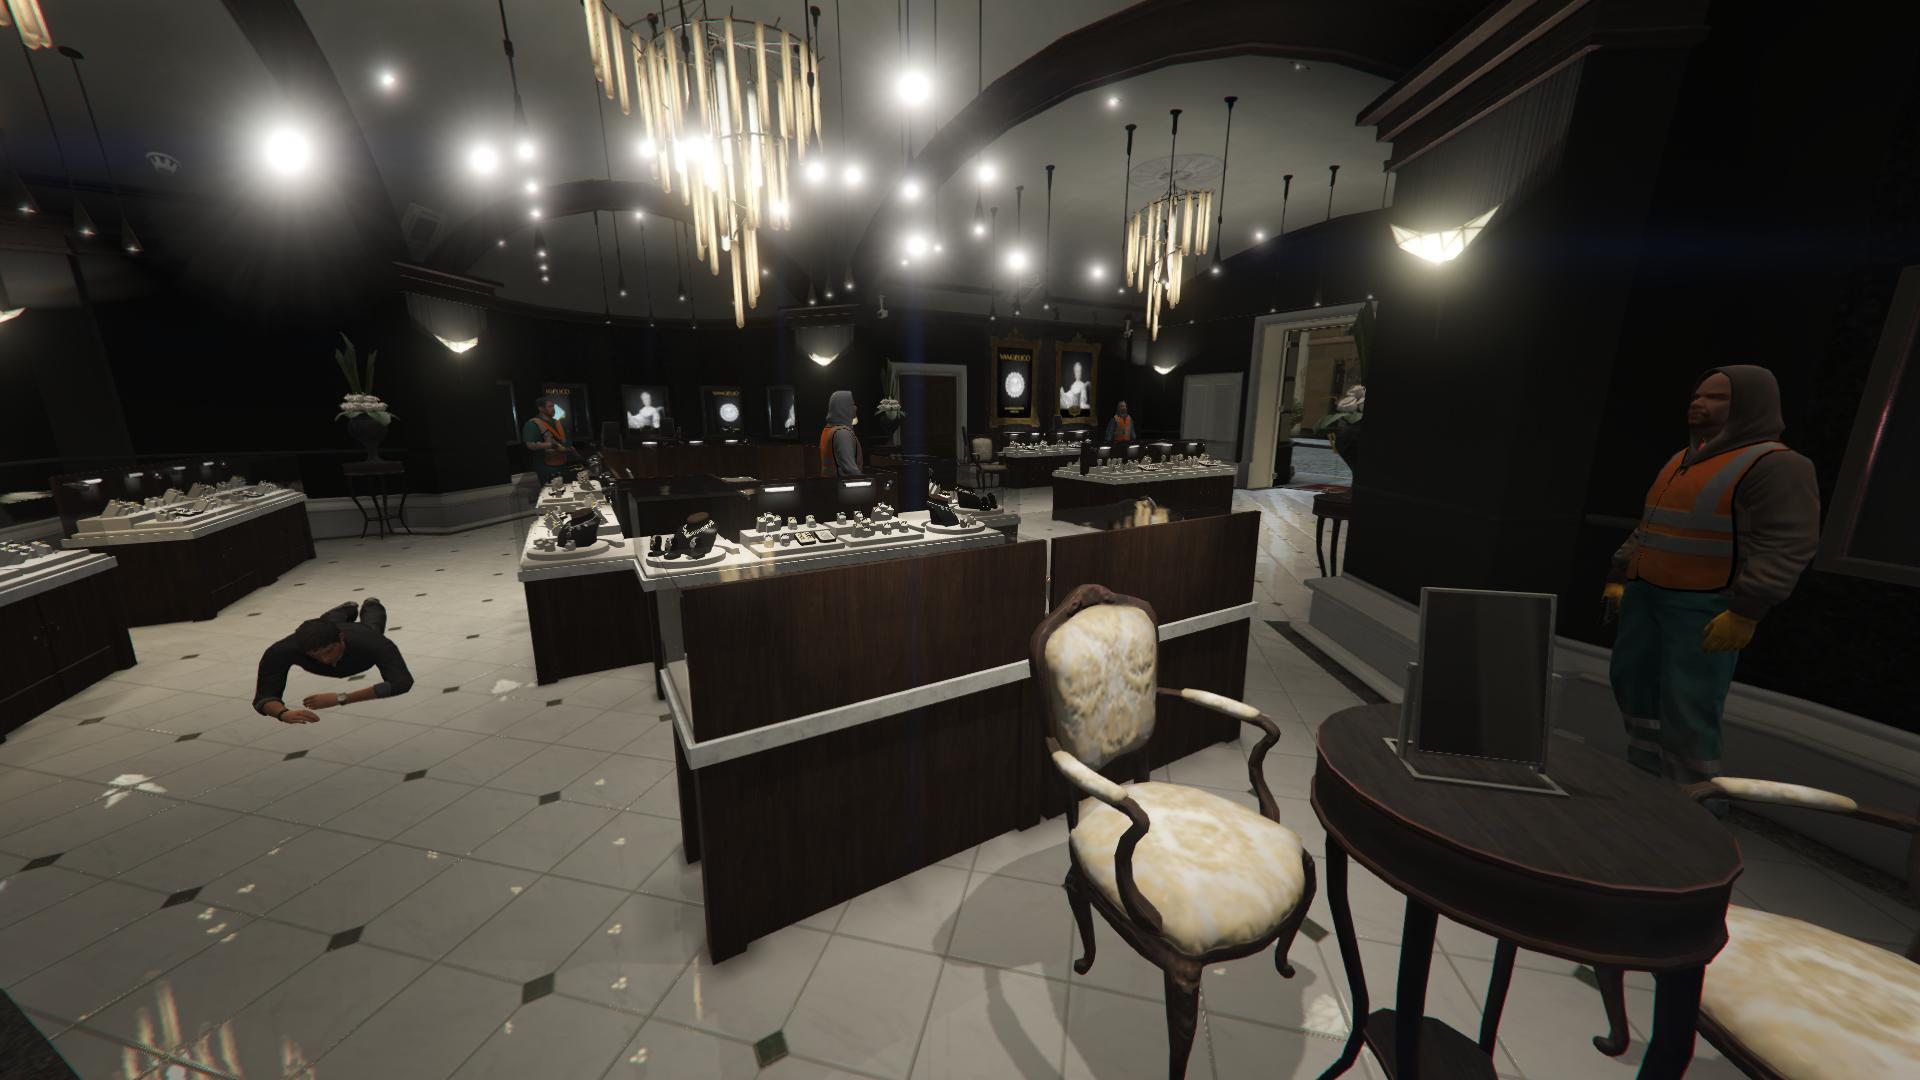 jewelry store robbery playable gta5 mods